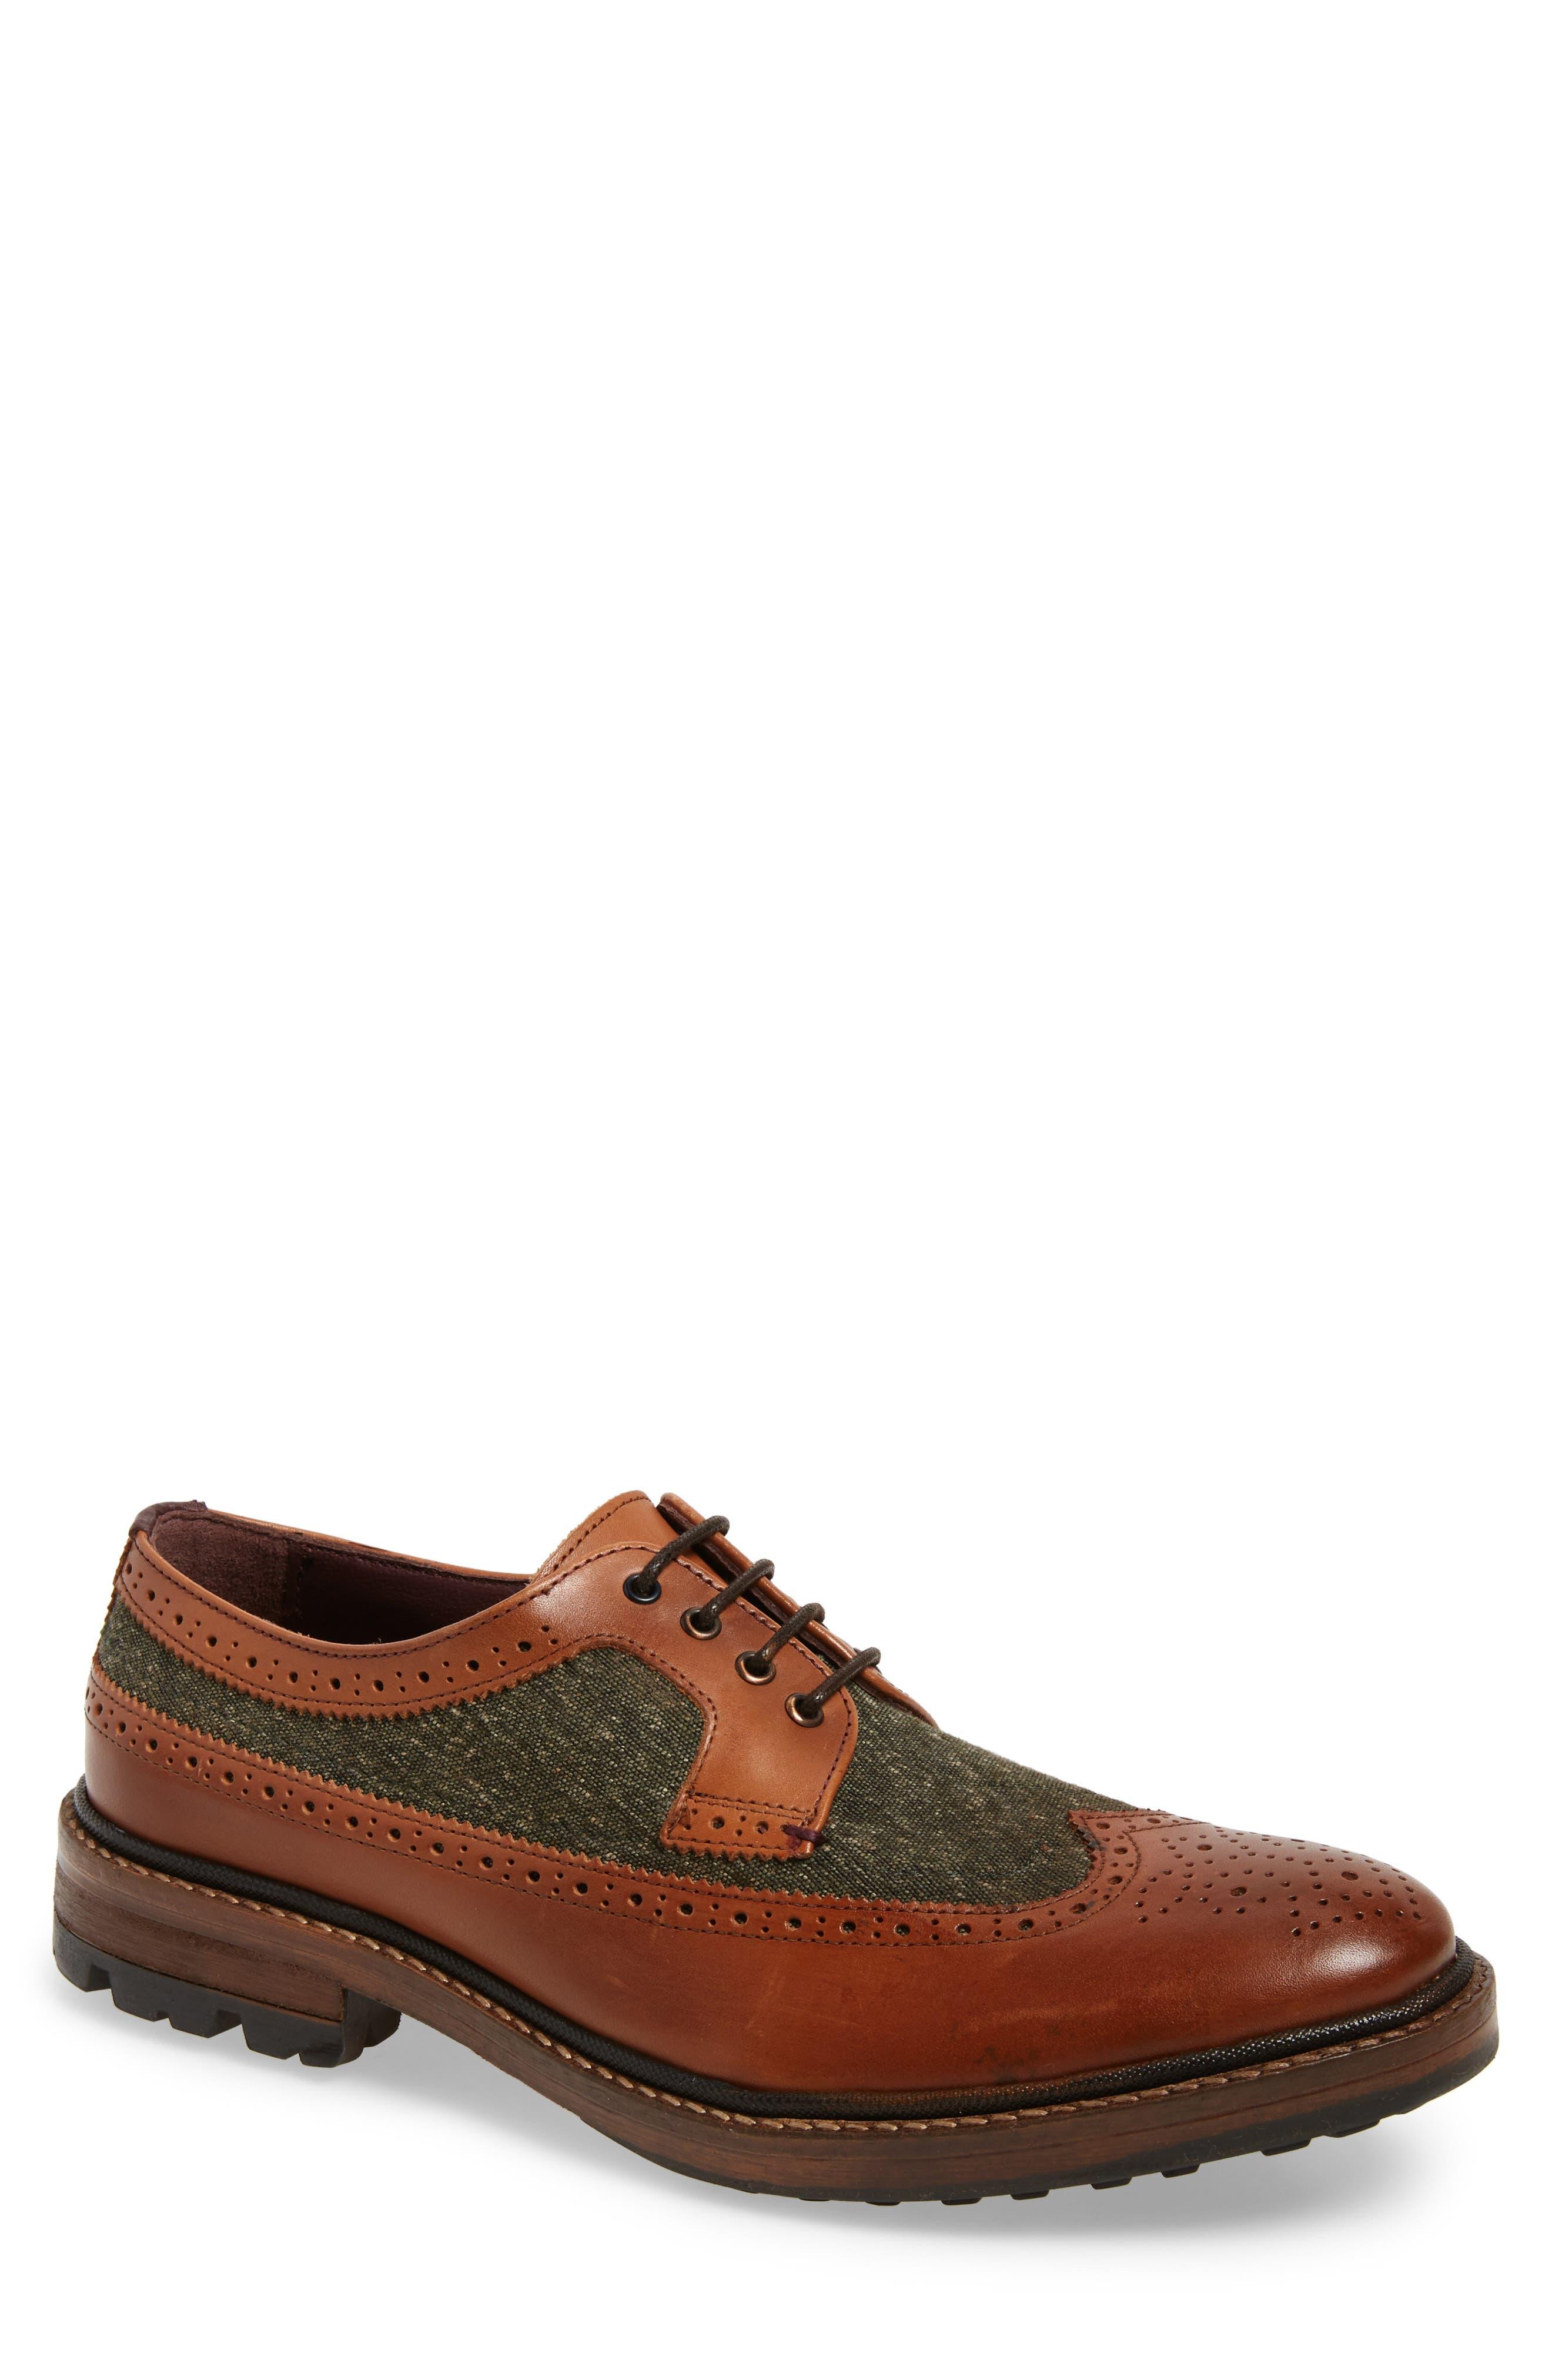 Casbo Spectator Shoe,                             Main thumbnail 2, color,